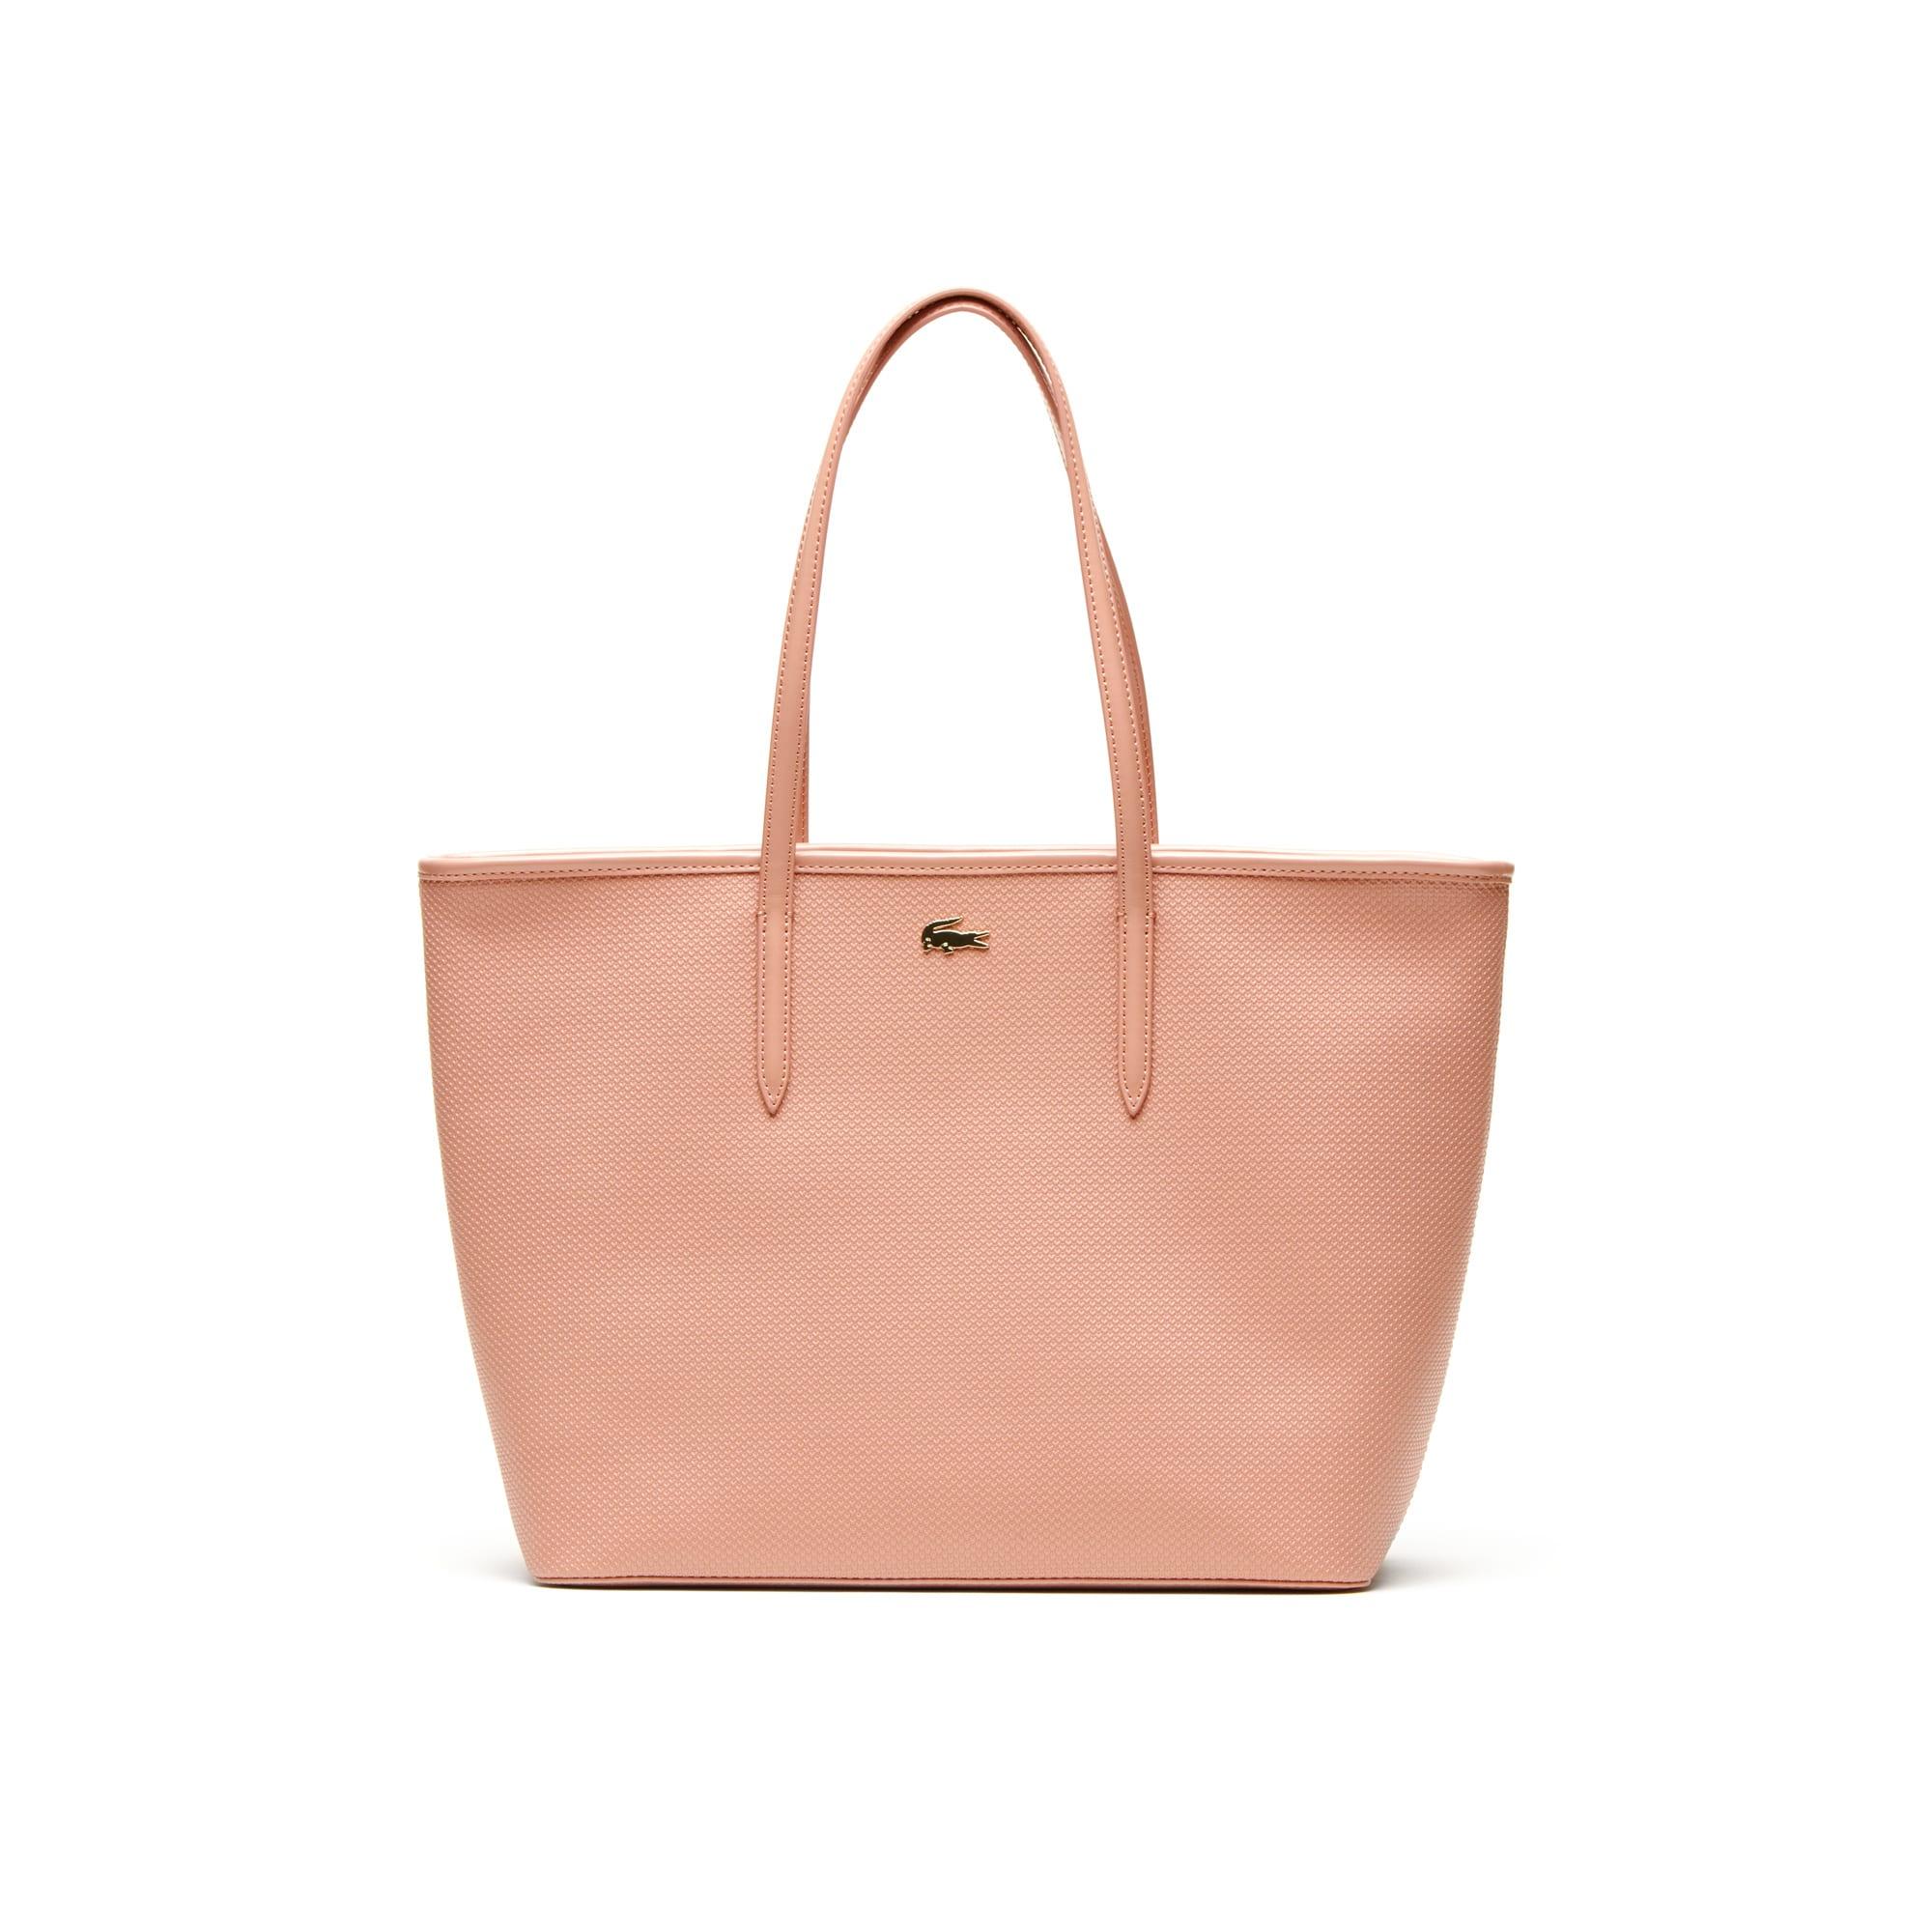 Medium shopping bag Chantaco in leather